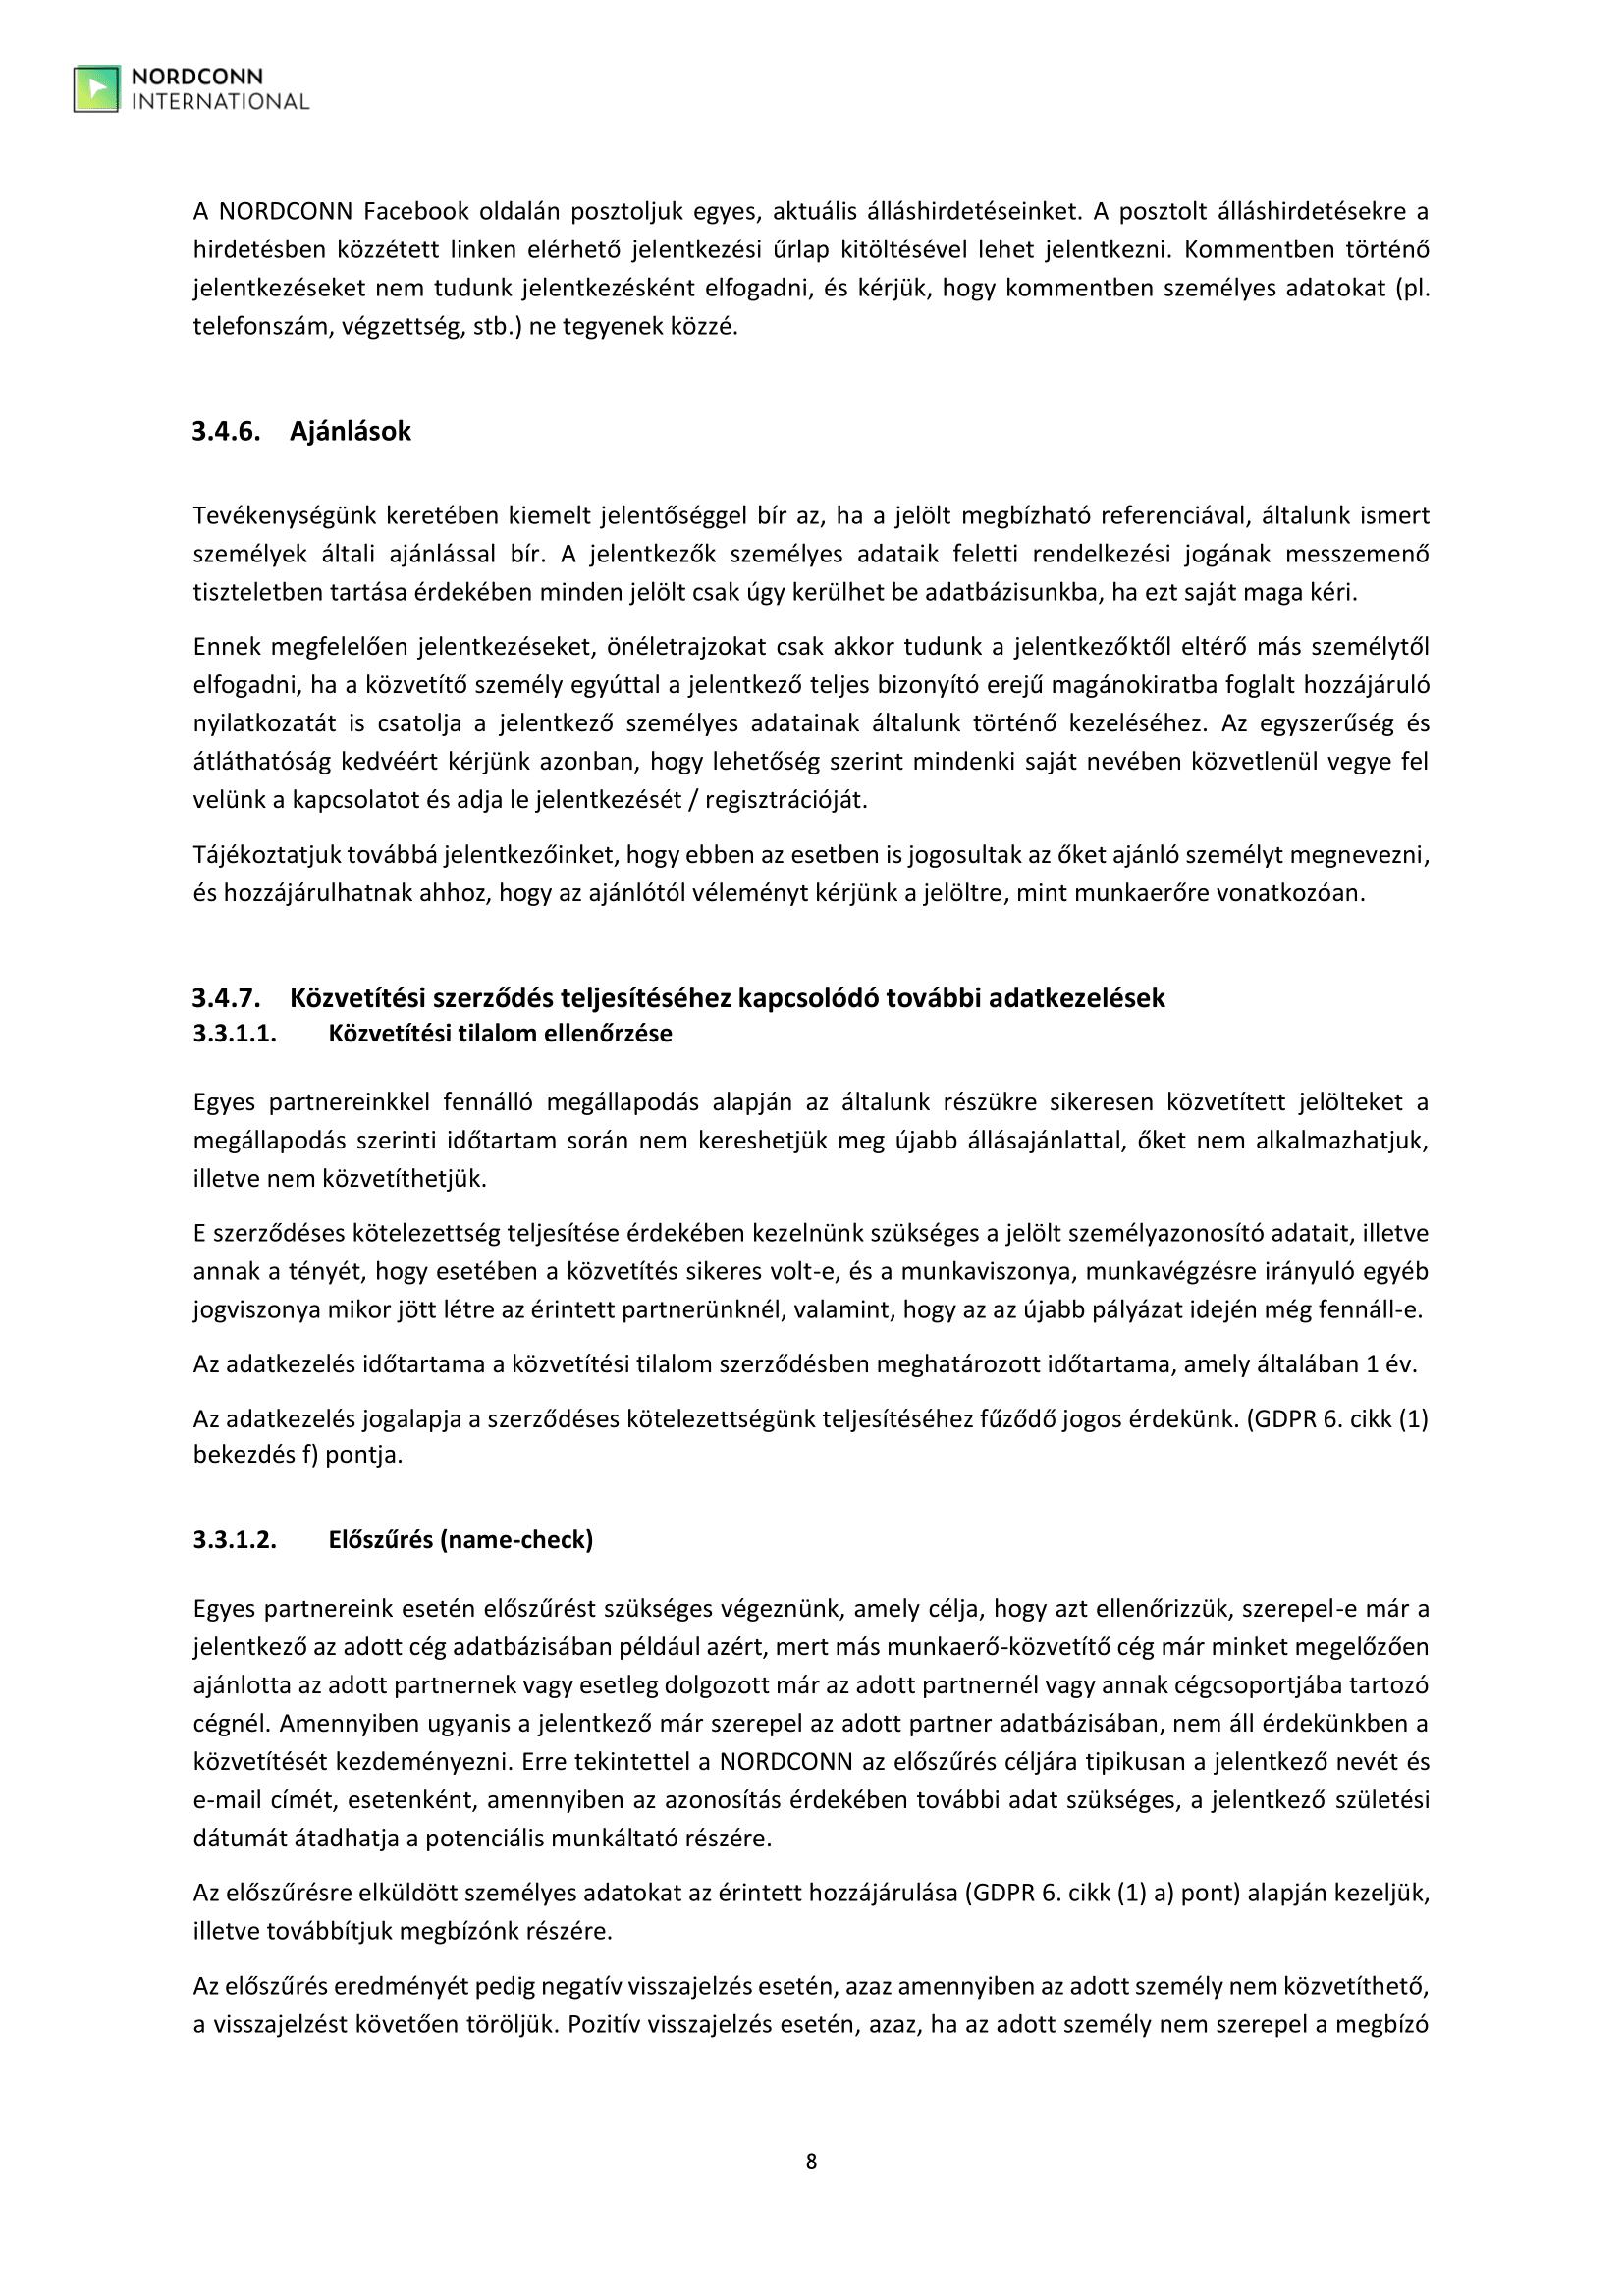 Adatkezelesi_01